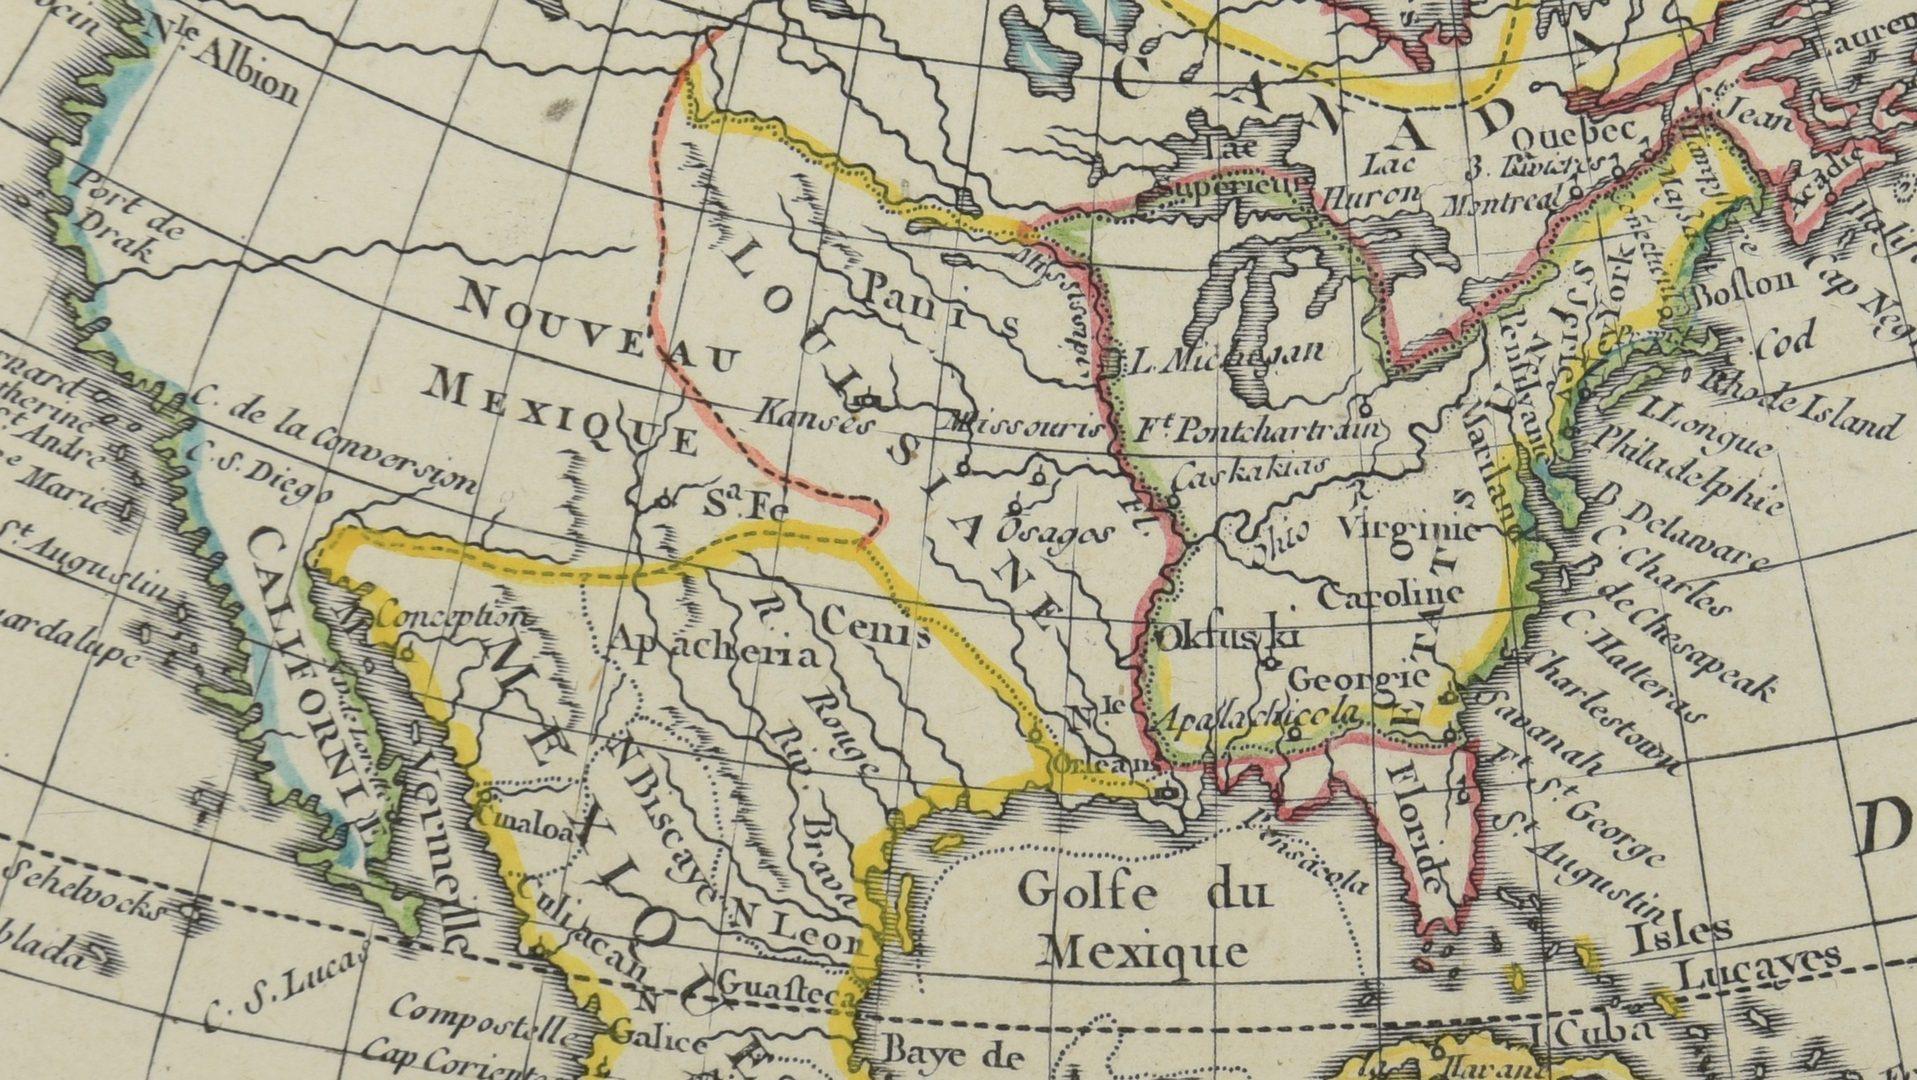 Lot 270: 2 Maps of US – 18th century